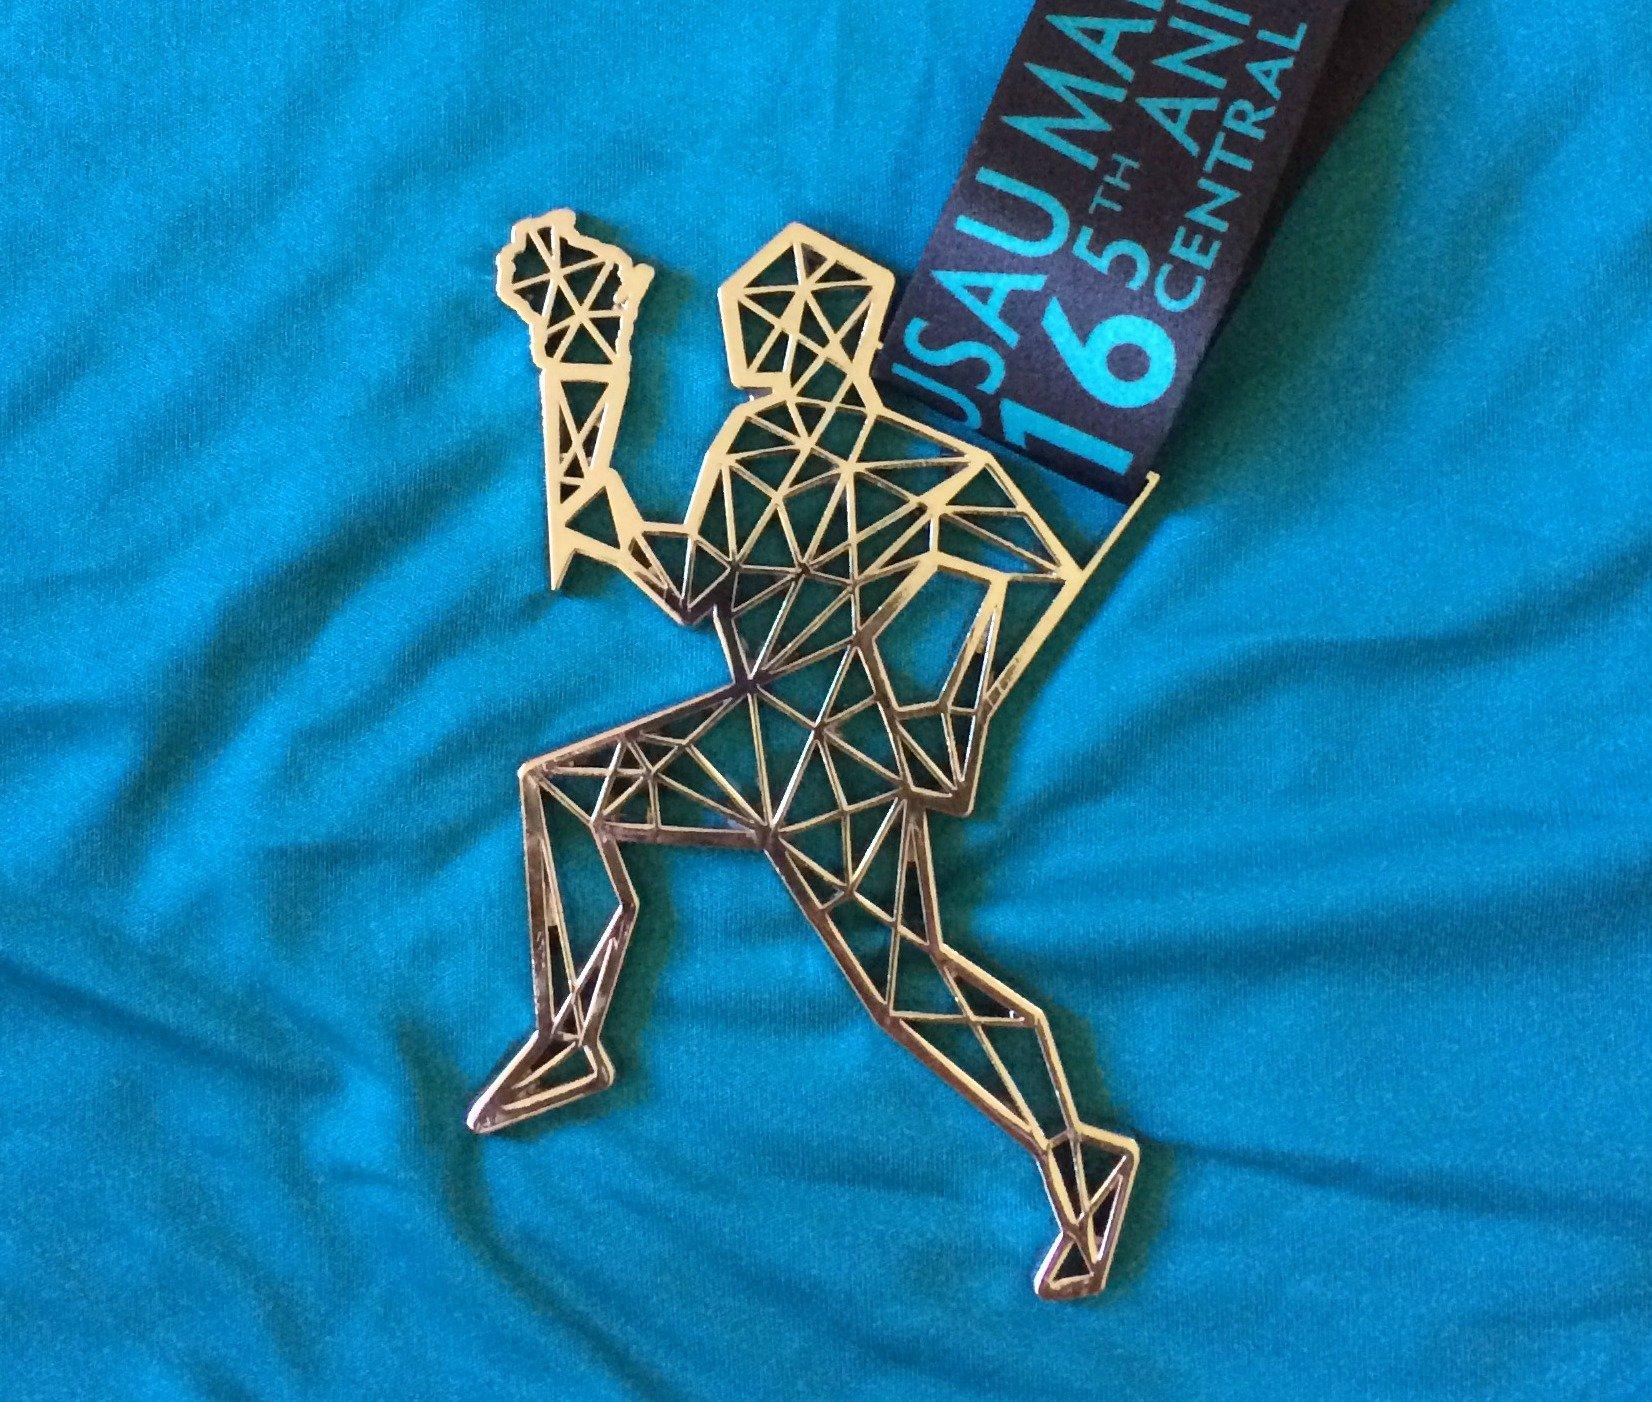 Wausau half marathon medal